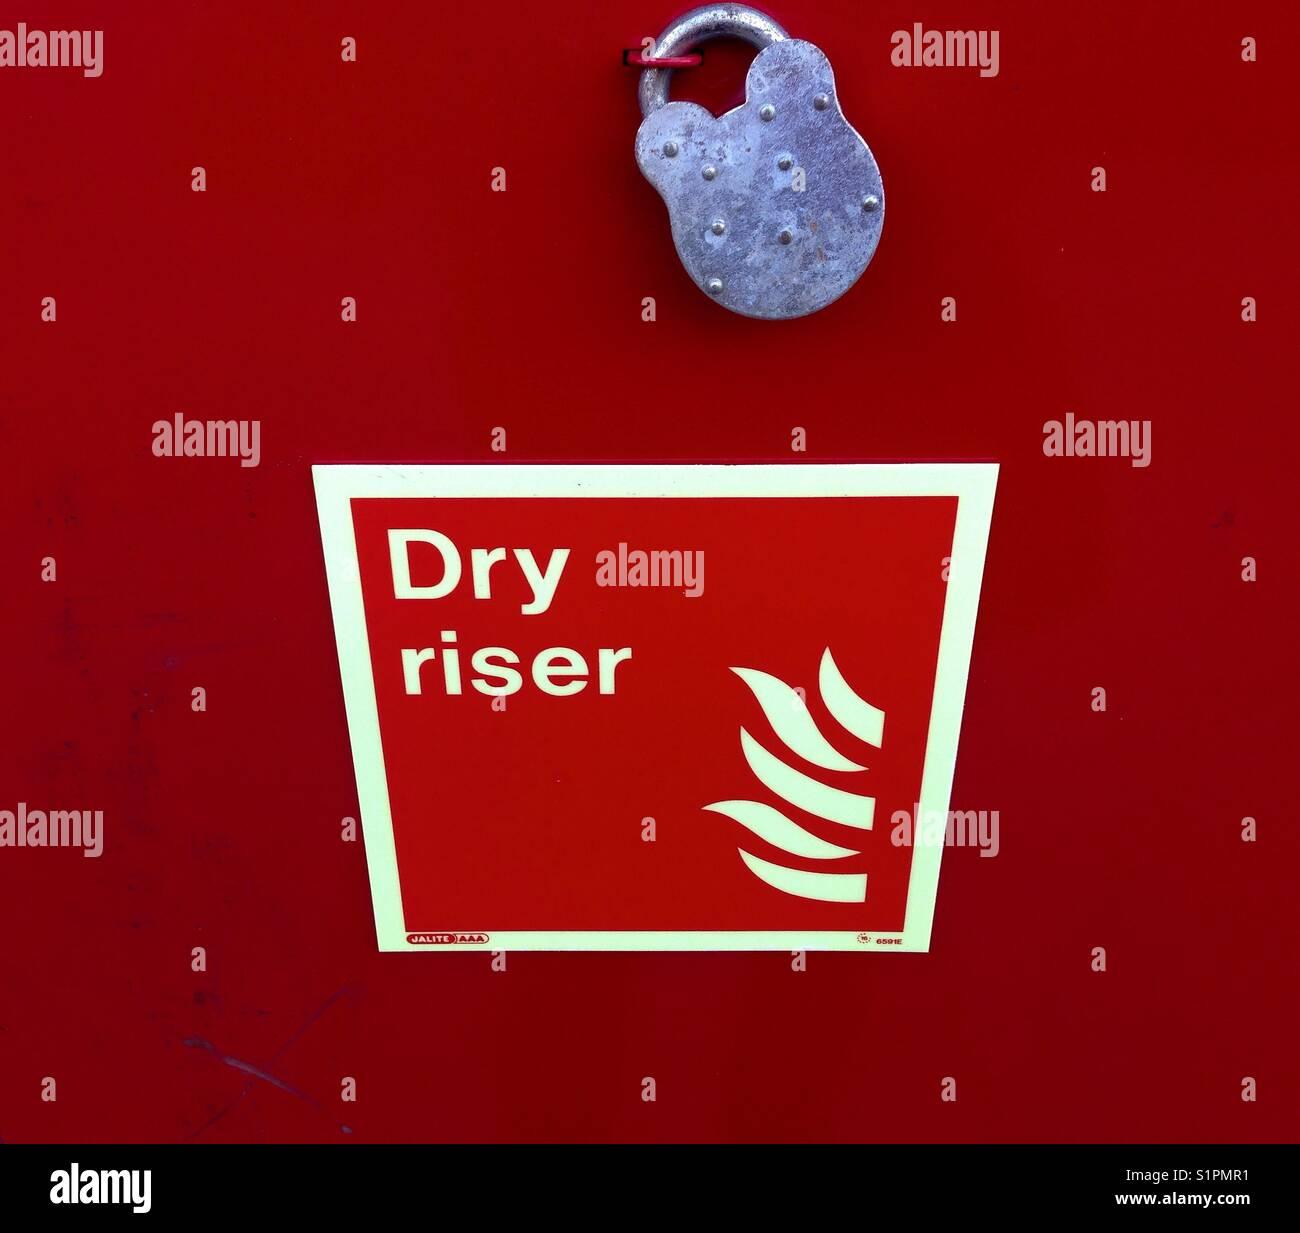 Dry riser locked on - Stock Image